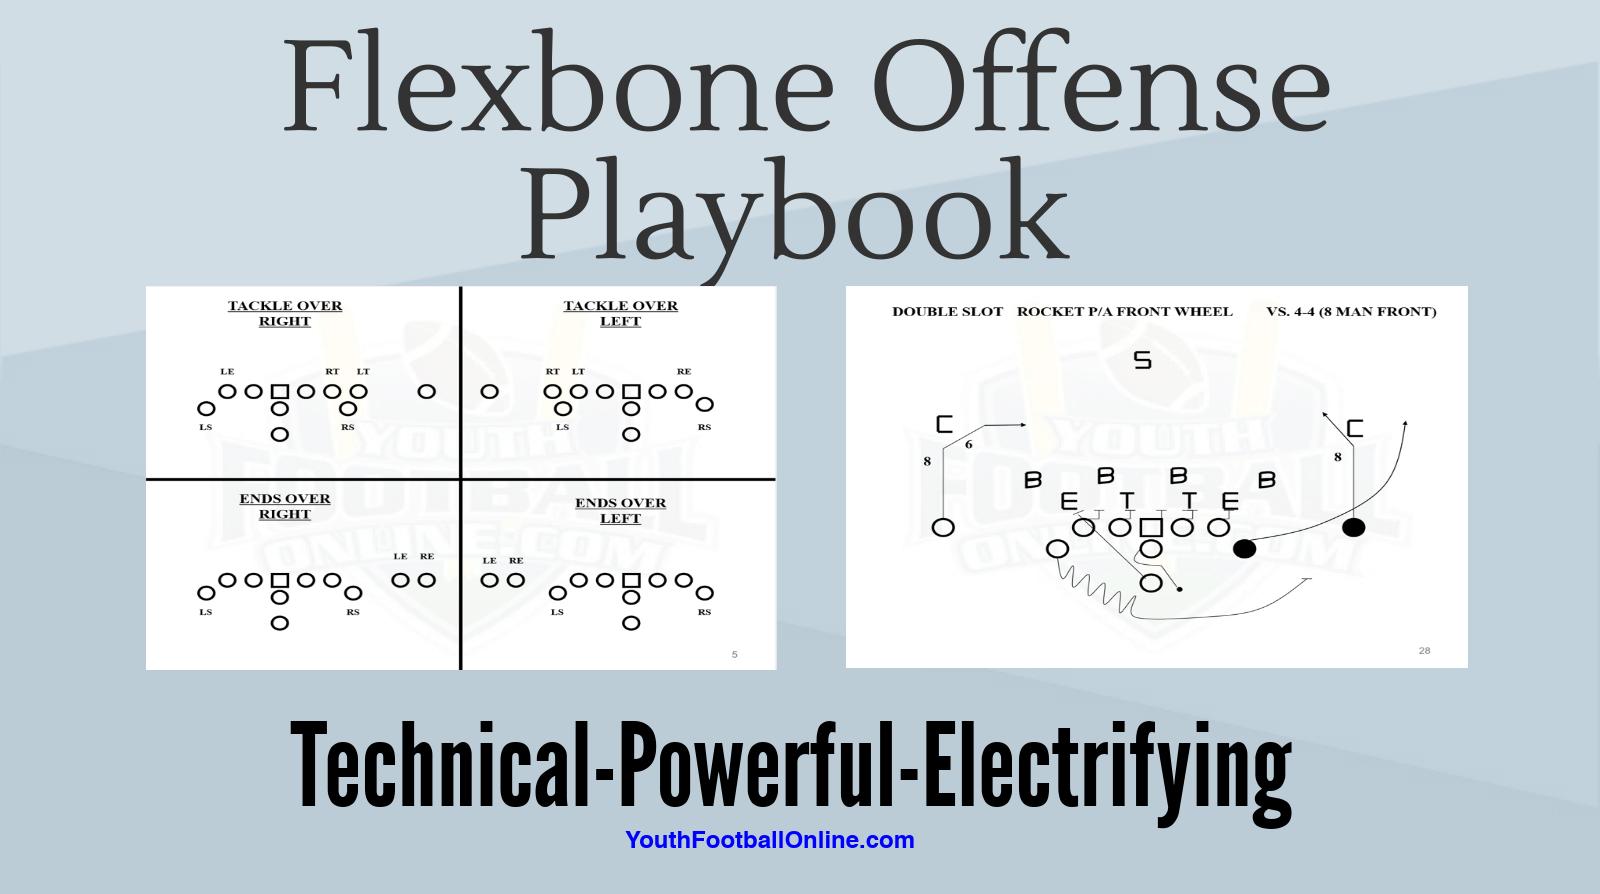 Flexbone Offense Playbook For Youth Football Football Playbook Youth Football Football Techniques Flag Football Plays